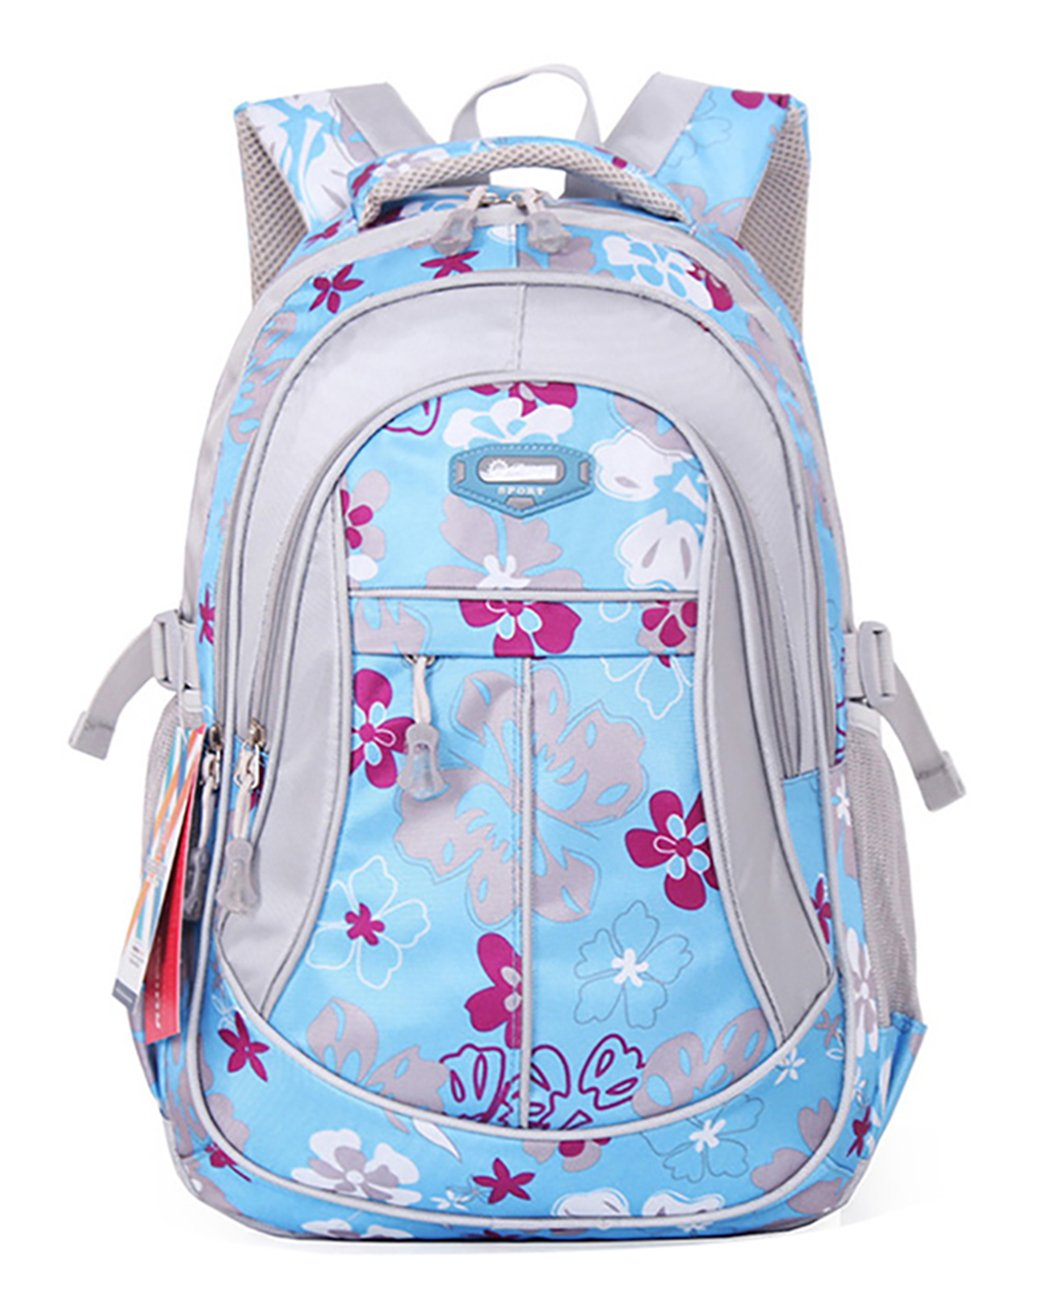 JiaYou Girl Flower Printed Primary Junior High University School Bag Bookbag Backpack(Style A Blue,24 Liters) by JiaYou